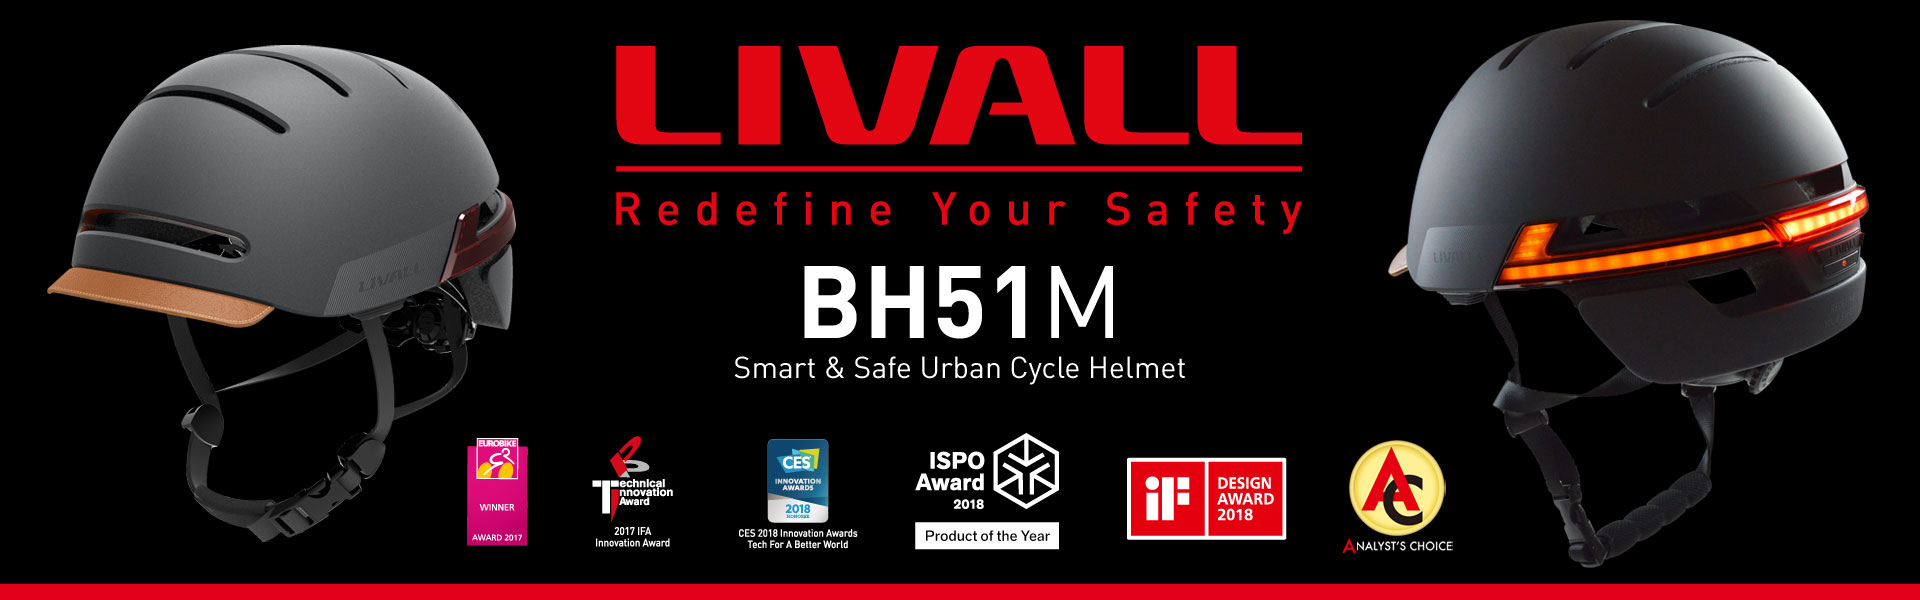 LIVALL BH51M Smart Helmet Banner